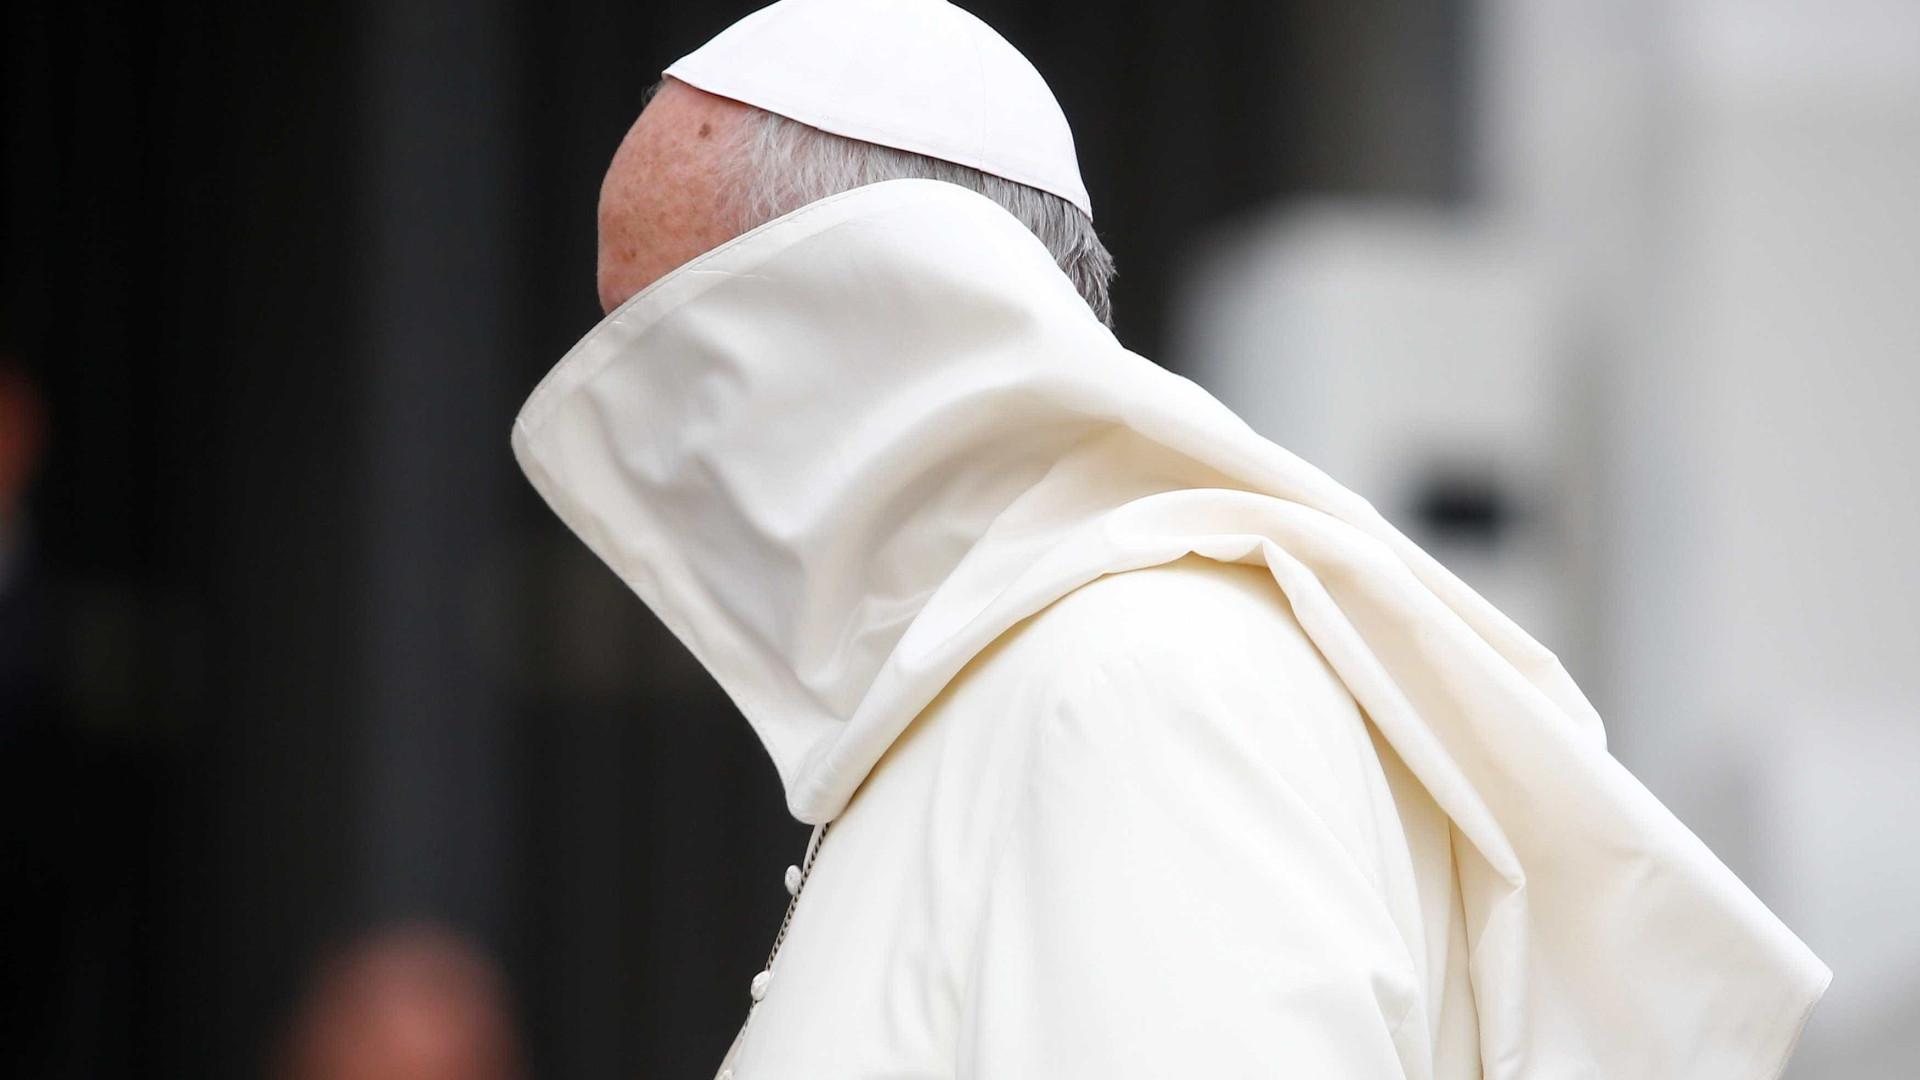 Papa orienta bispos a barrar seminaristas gays, afirma jornal